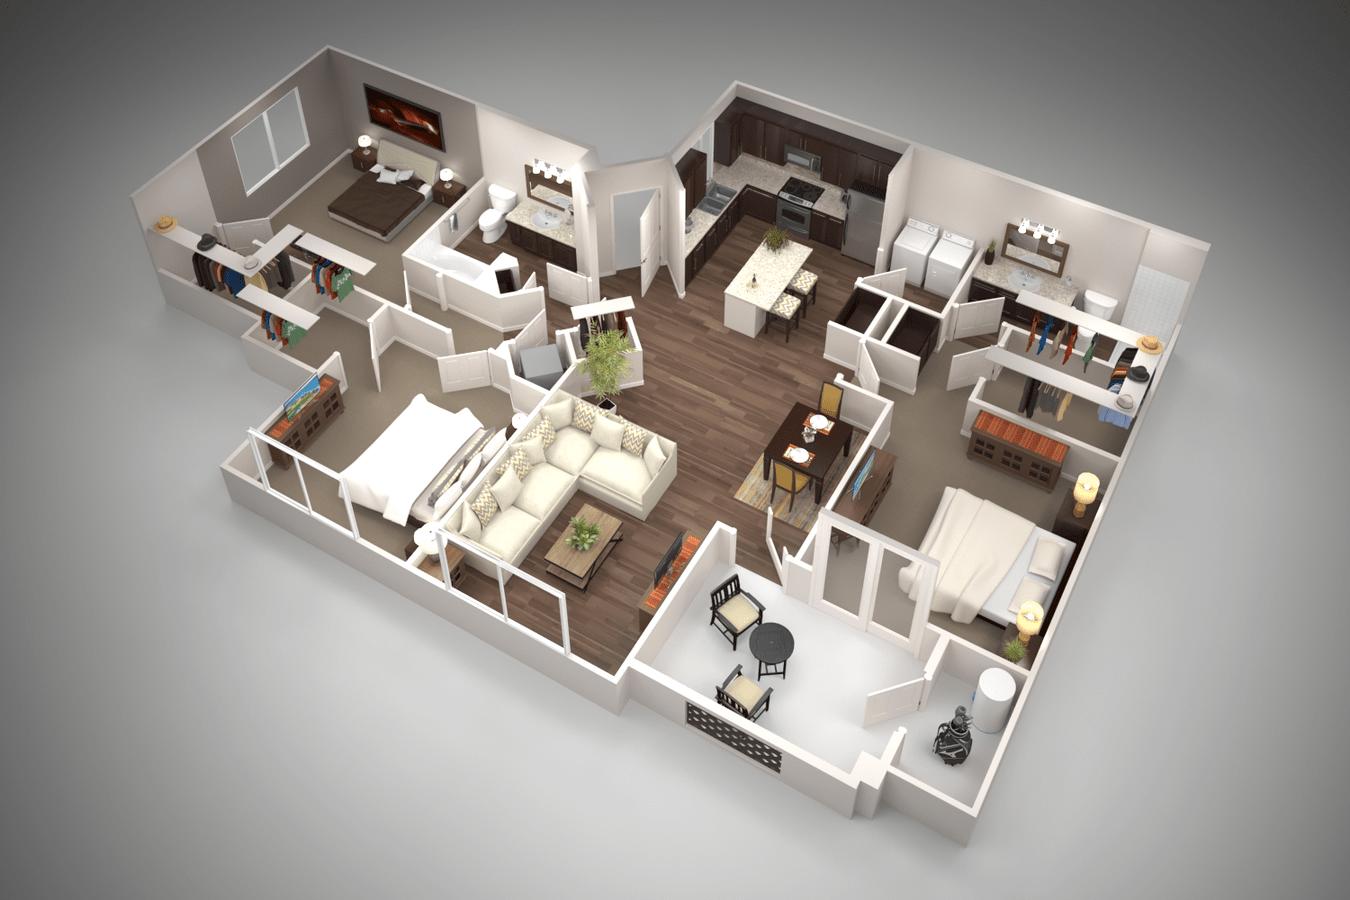 3 Bedrooms 2 Bathrooms Apartment for rent at San Piedra in Mesa, AZ